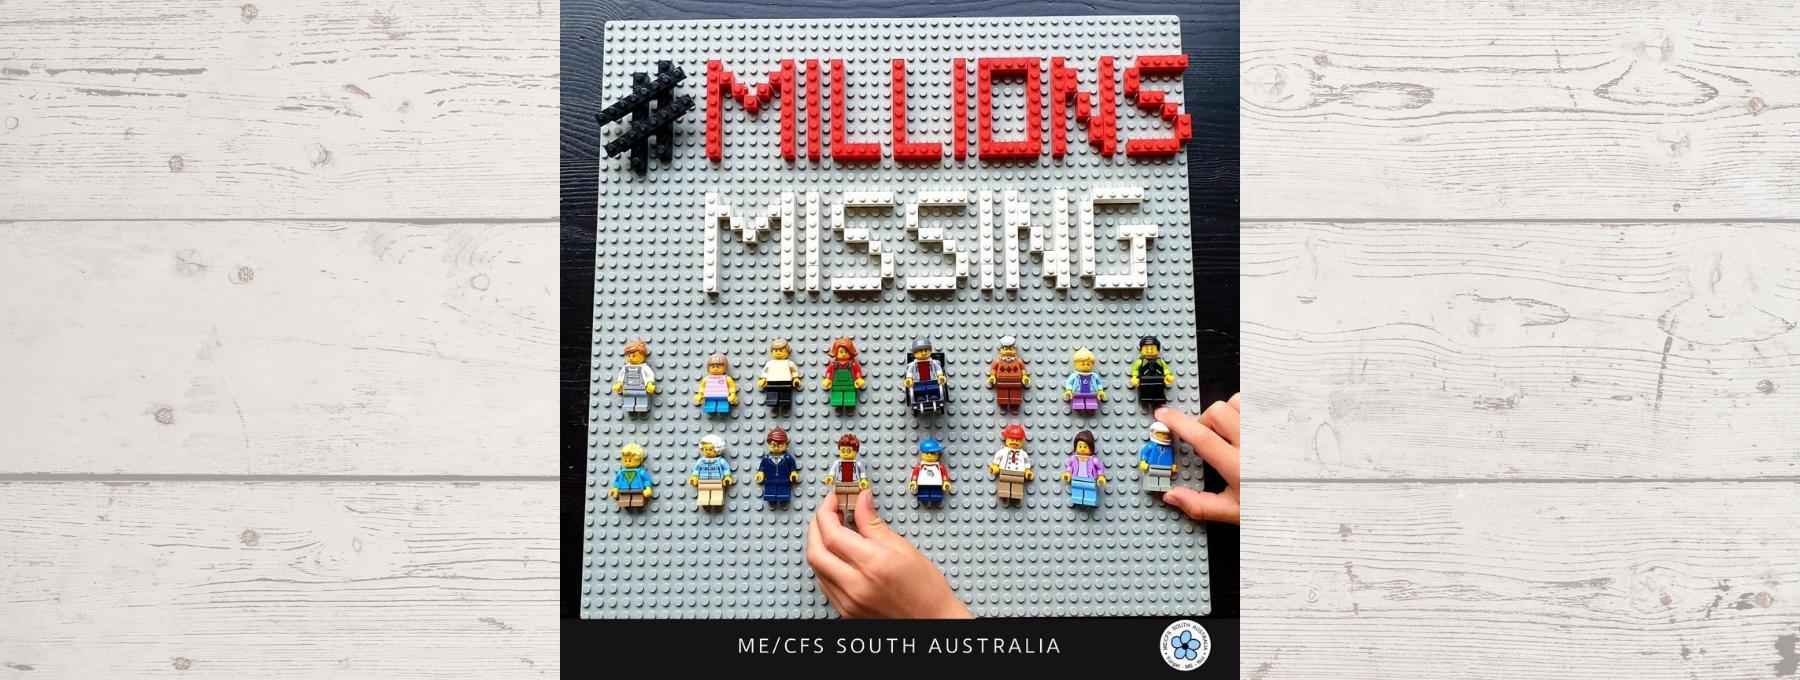 2020 Millions Missing 1800 x 680 1